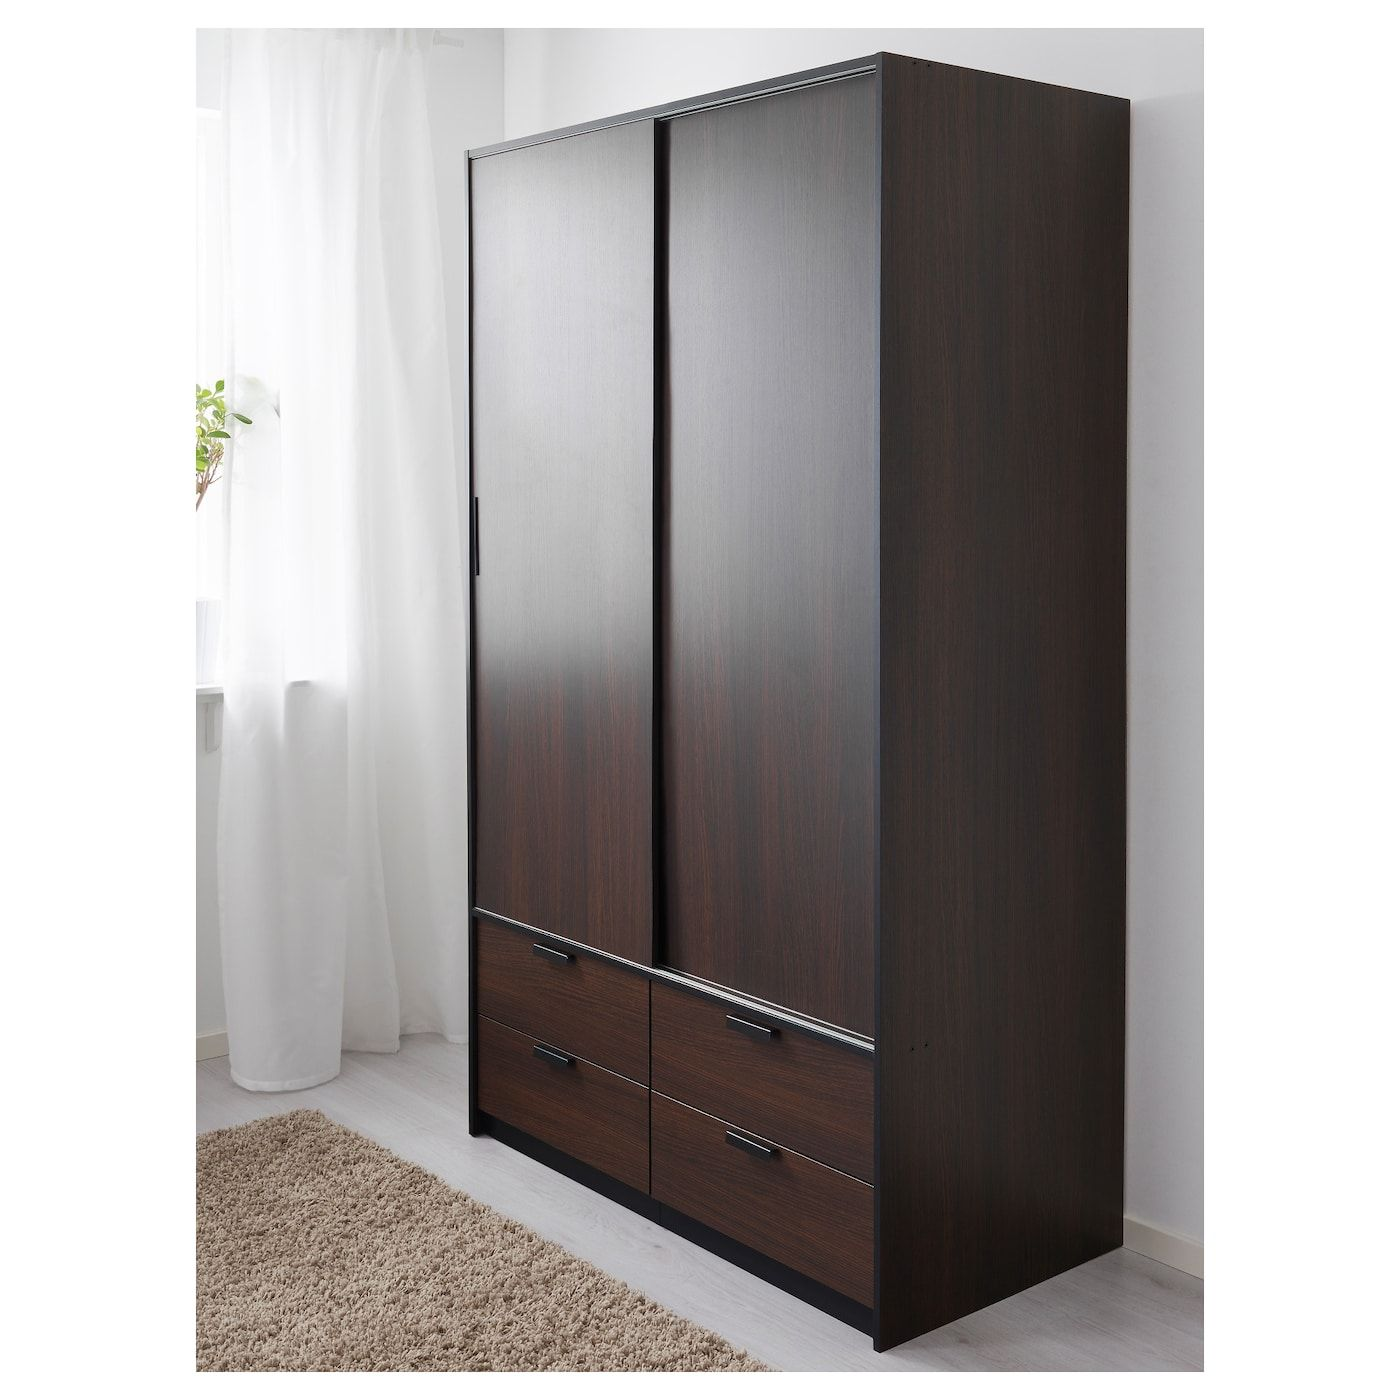 Us Furniture And Home Furnishings Wardrobe Drawers Ikea